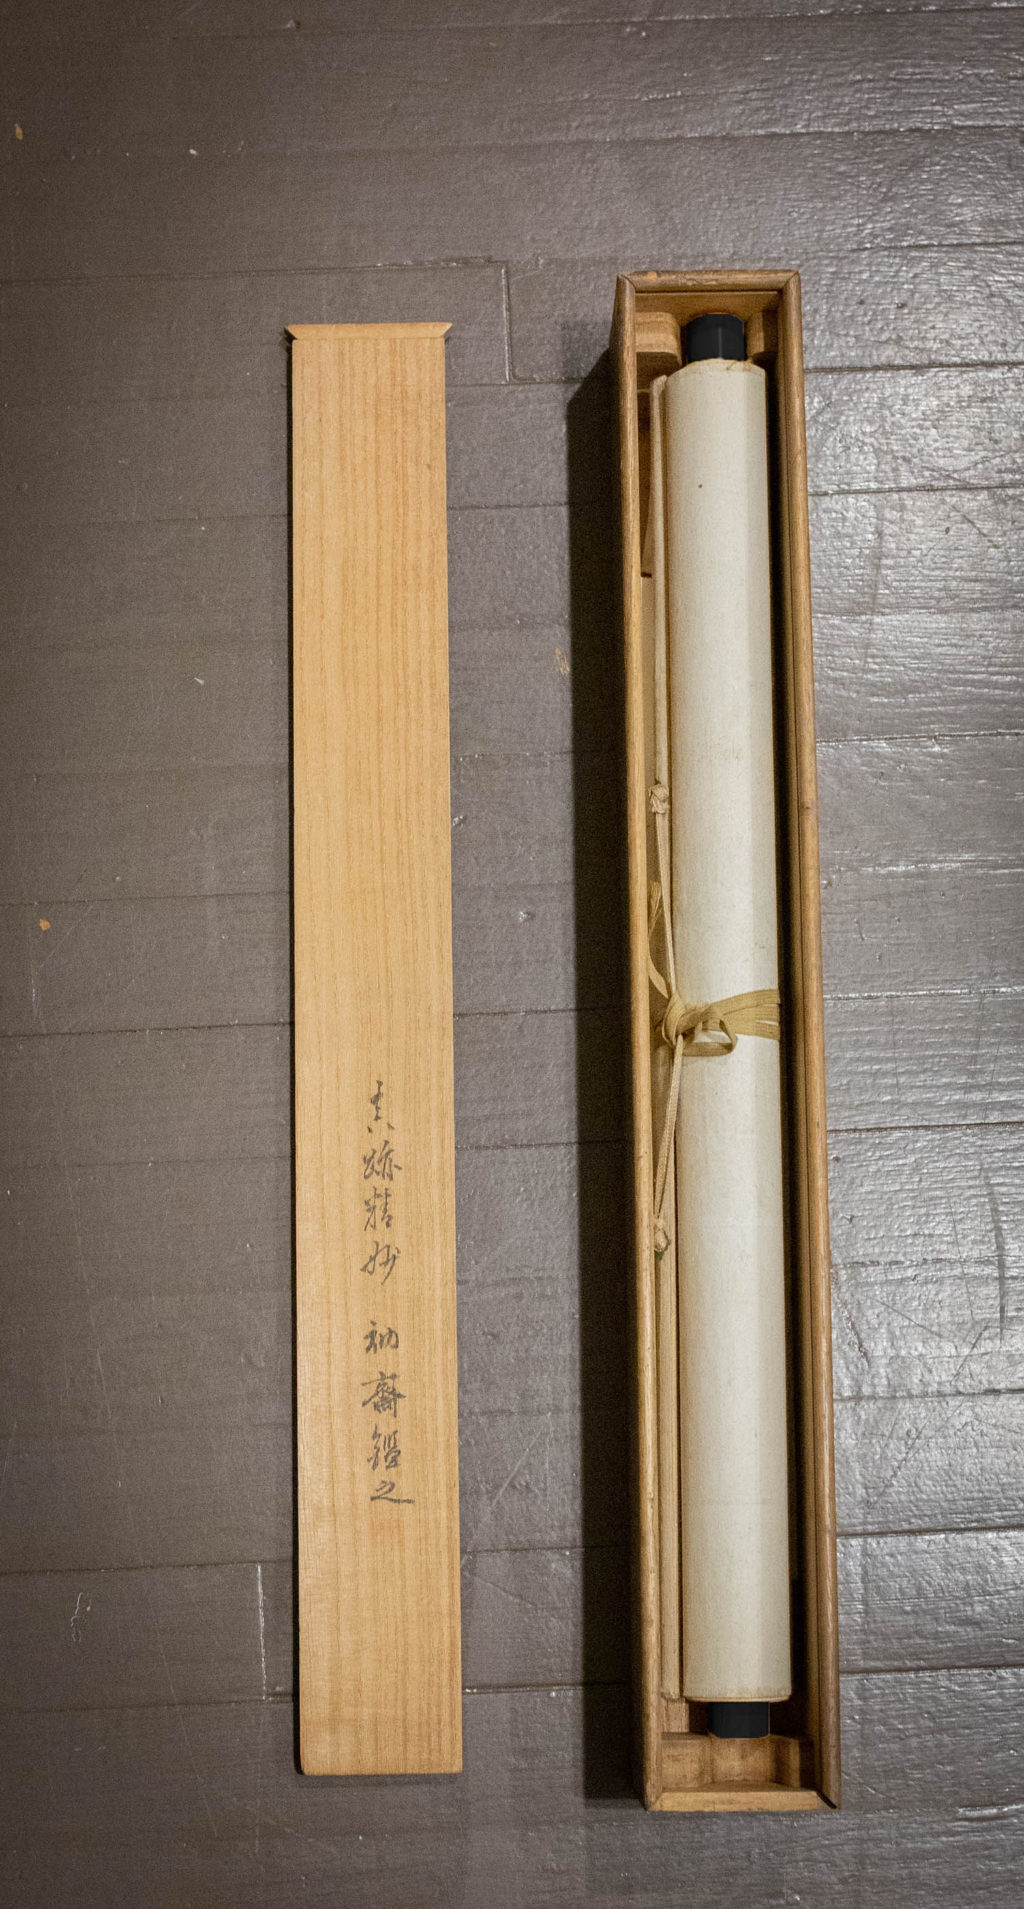 Japanese 18th Century Scroll of Shogun Ashikaga Takauji